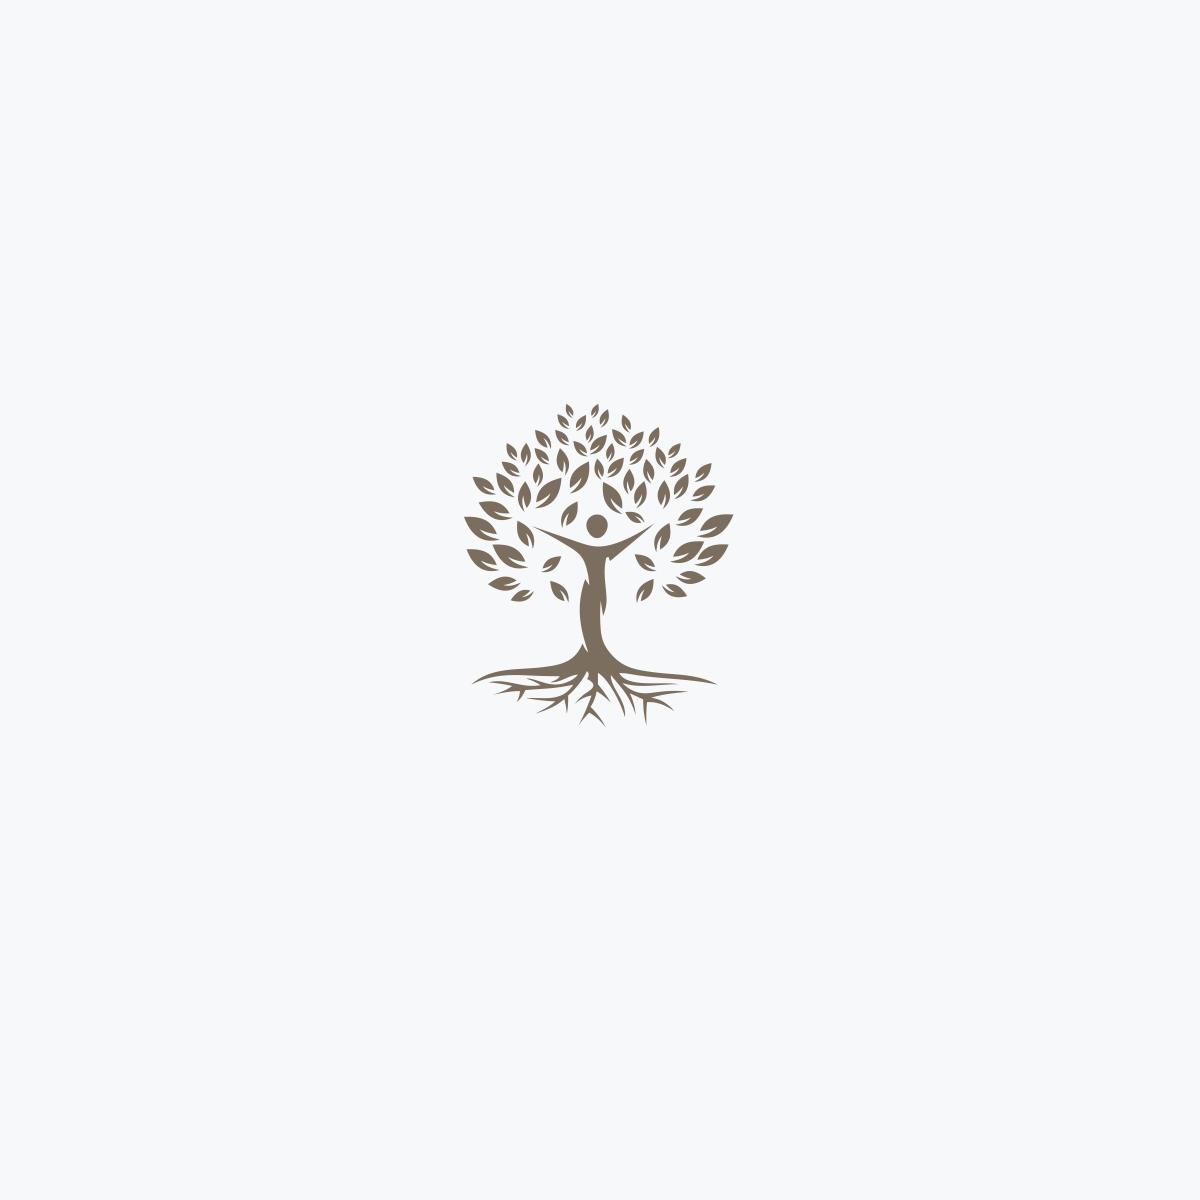 Reproduce logo in Brand Color